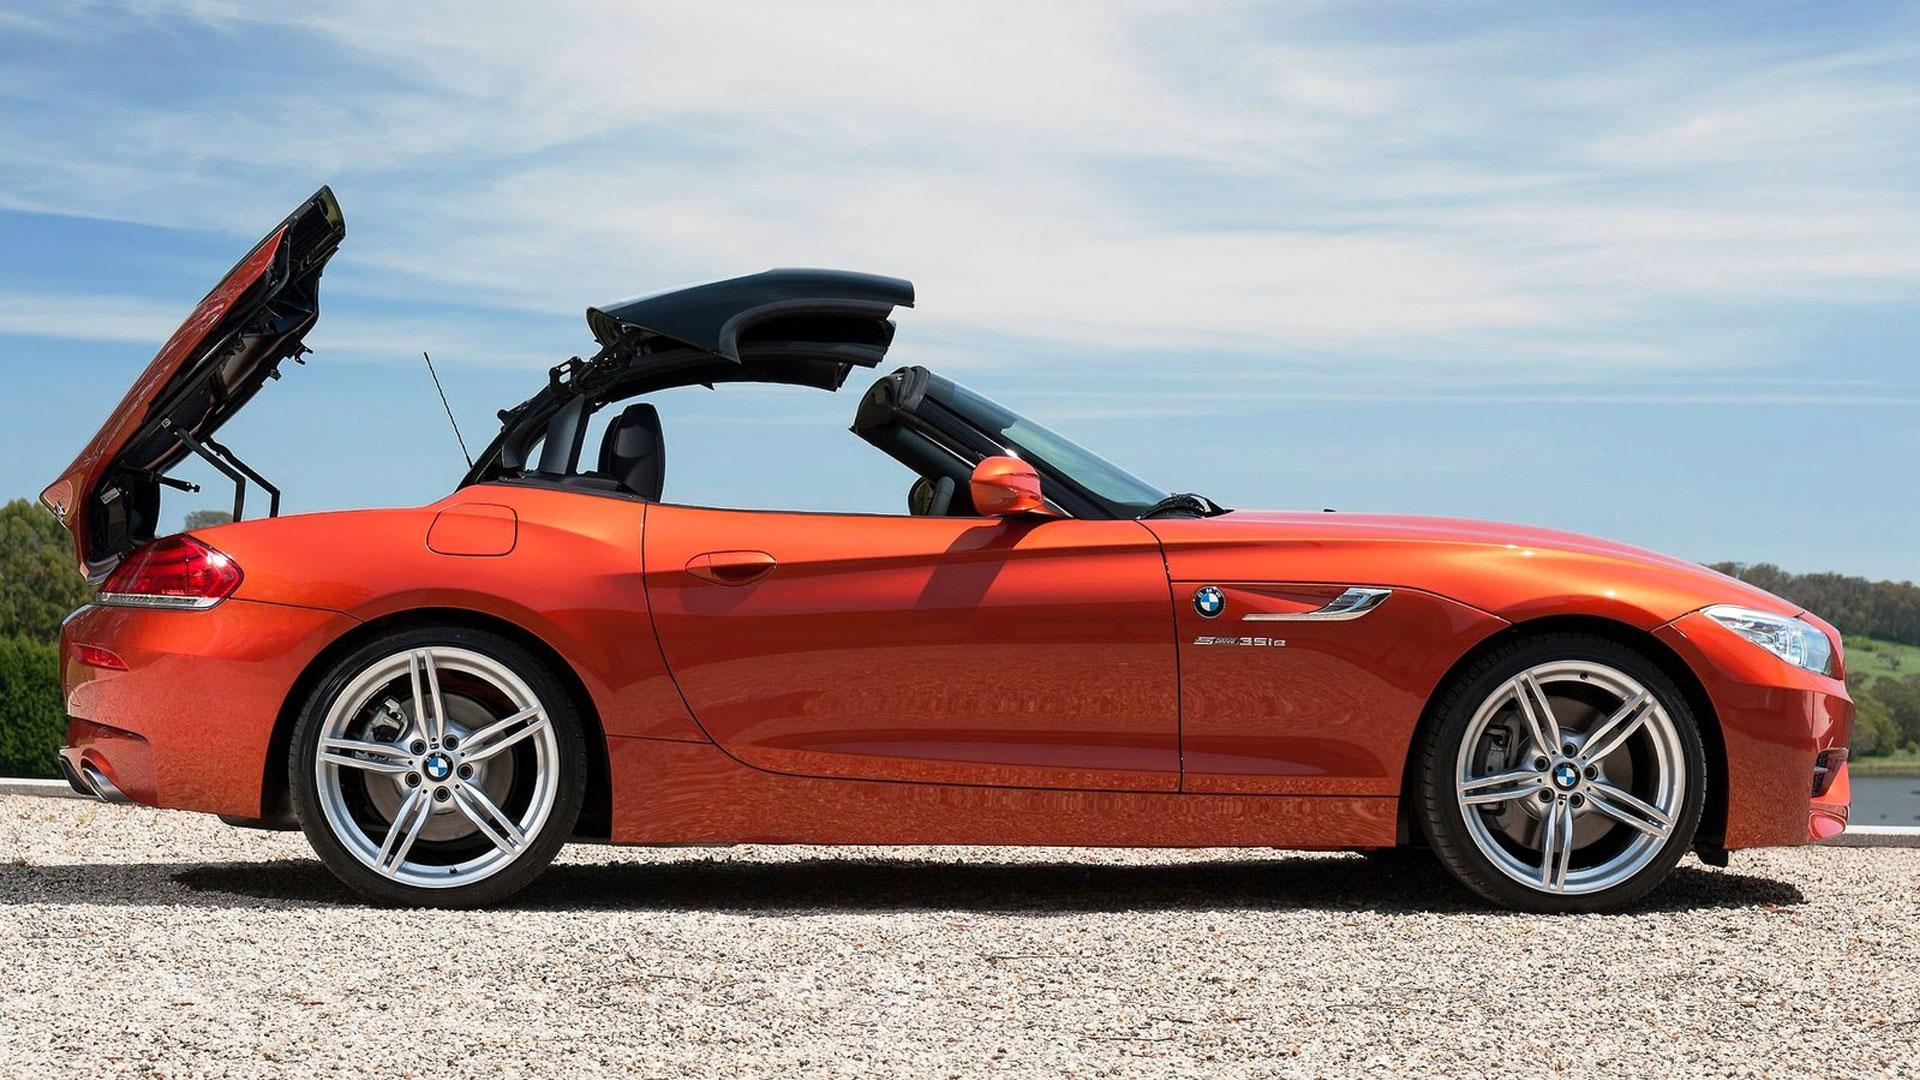 New BMW Sports Cars HD Wallpaper of Car   hdwallpaper2013com 1920x1080